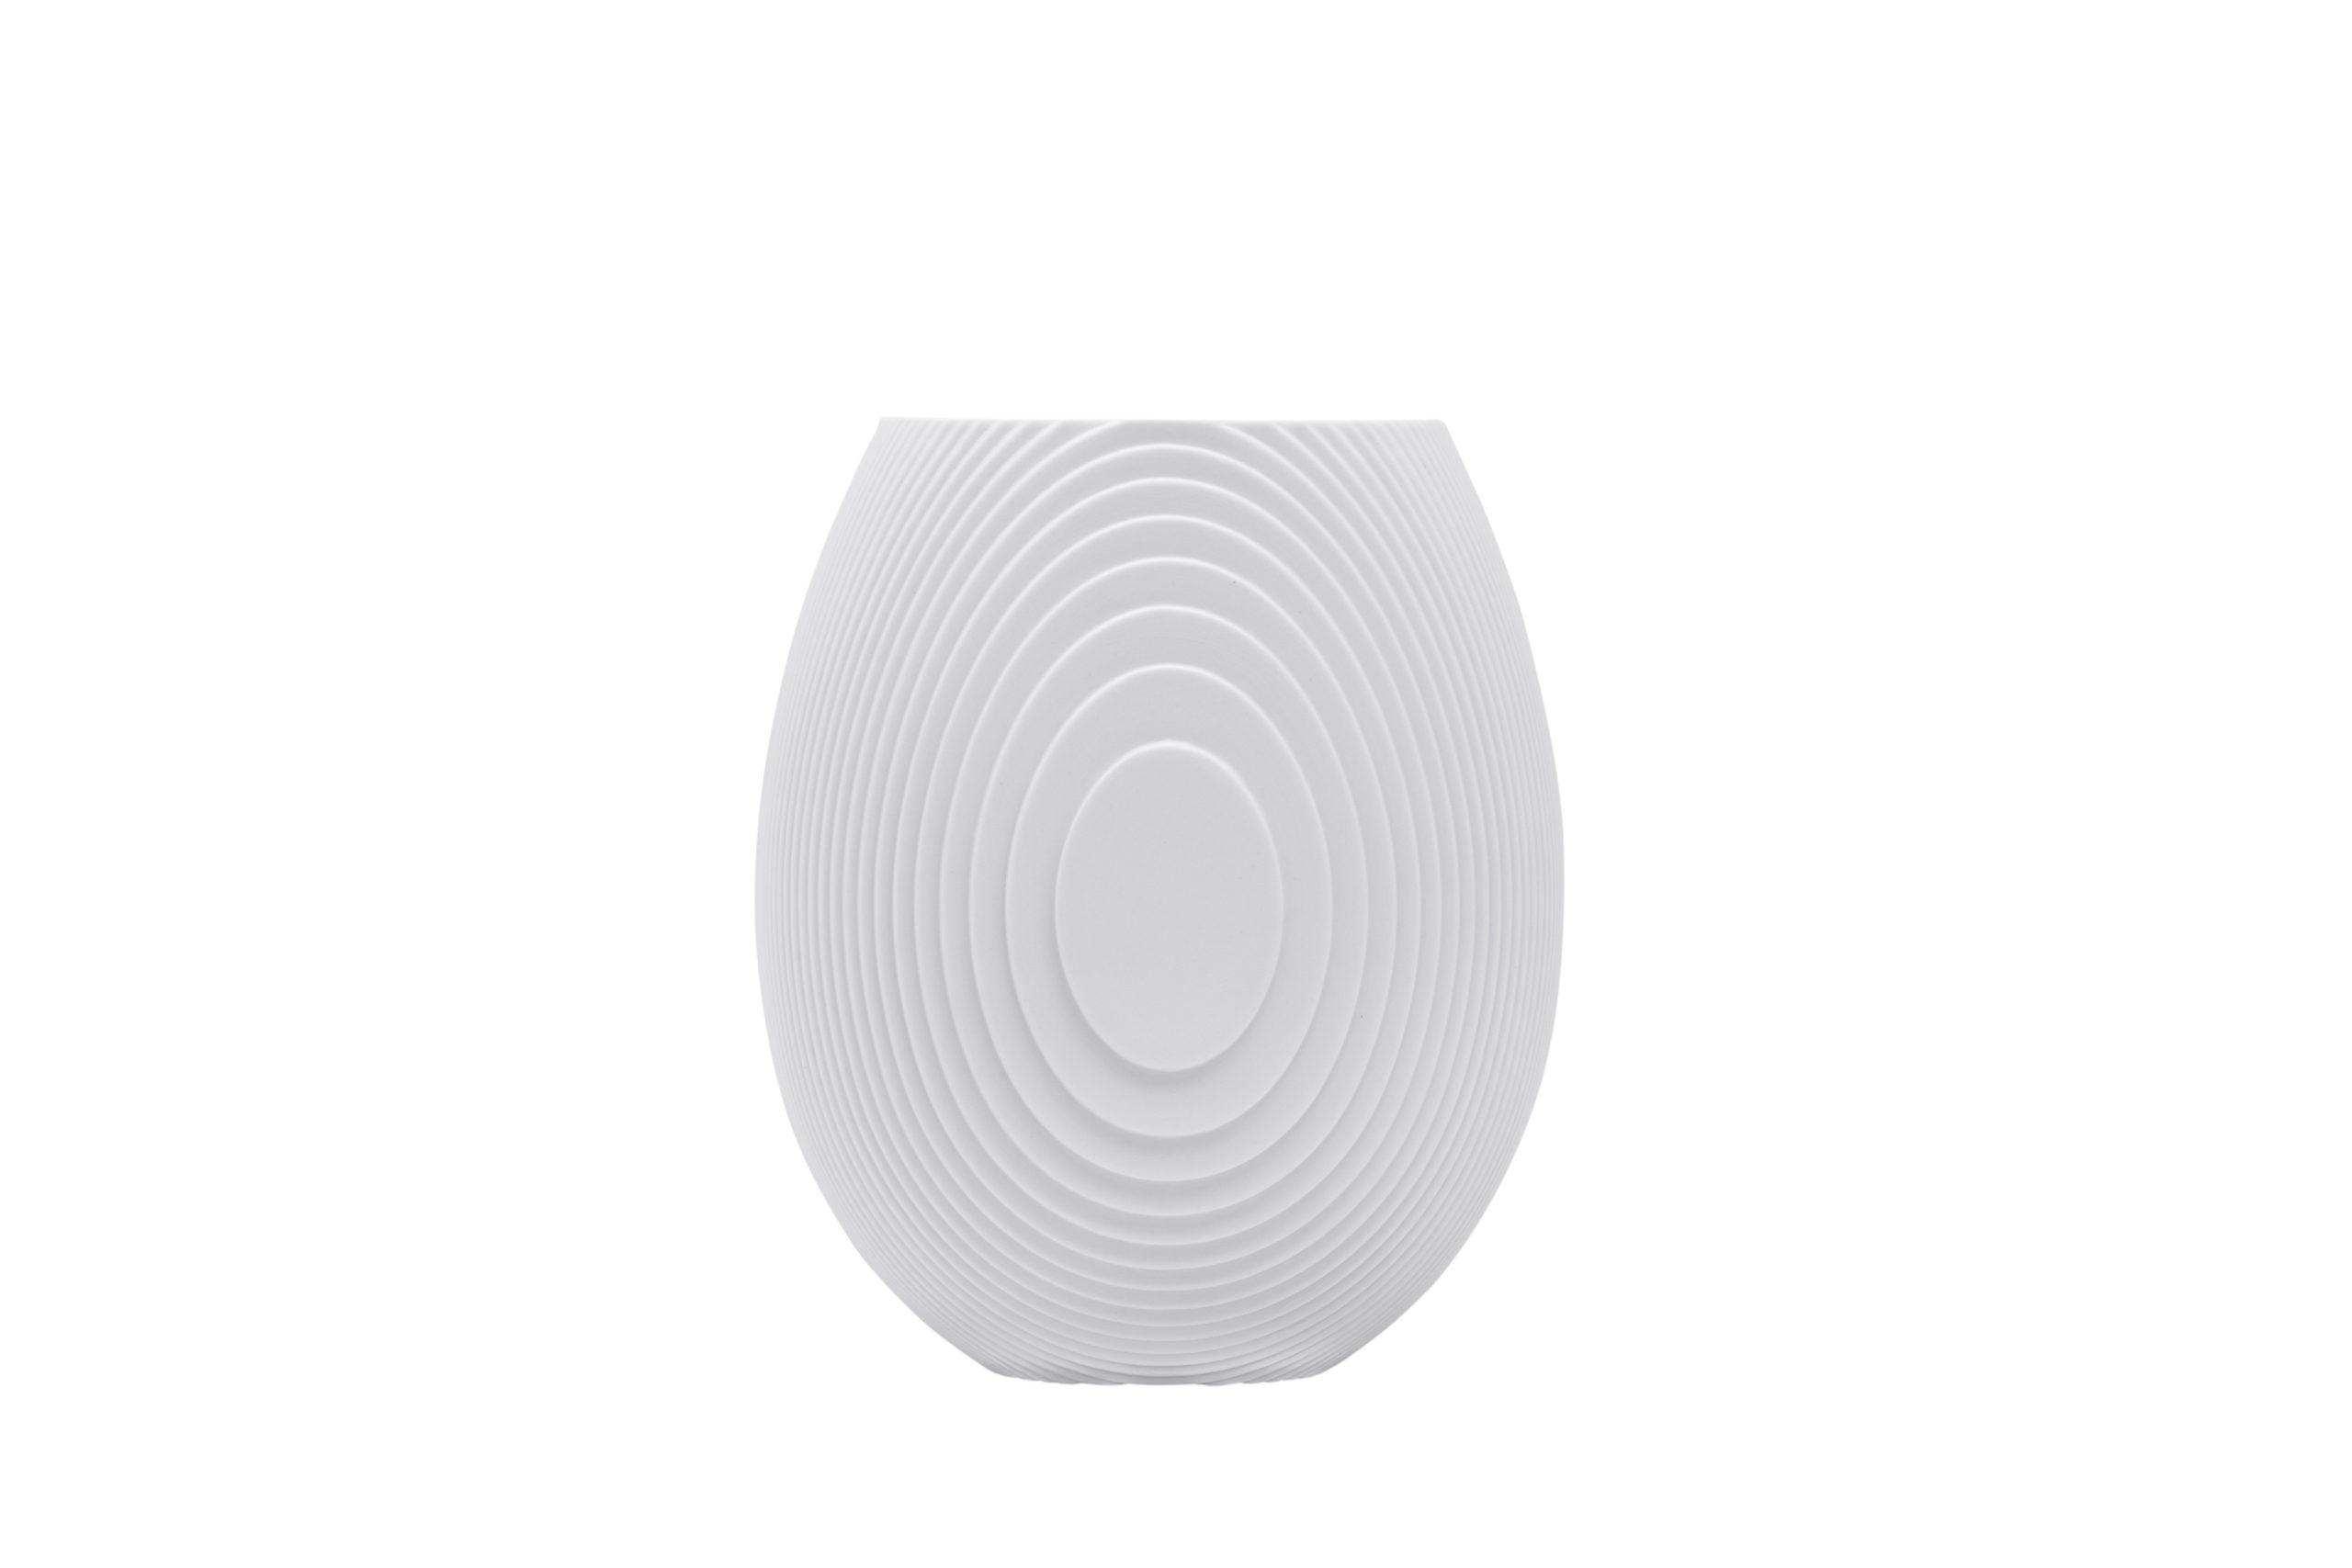 Architectmade-Flow-Bubble-Porcelain-Vibeke-Rytter-1